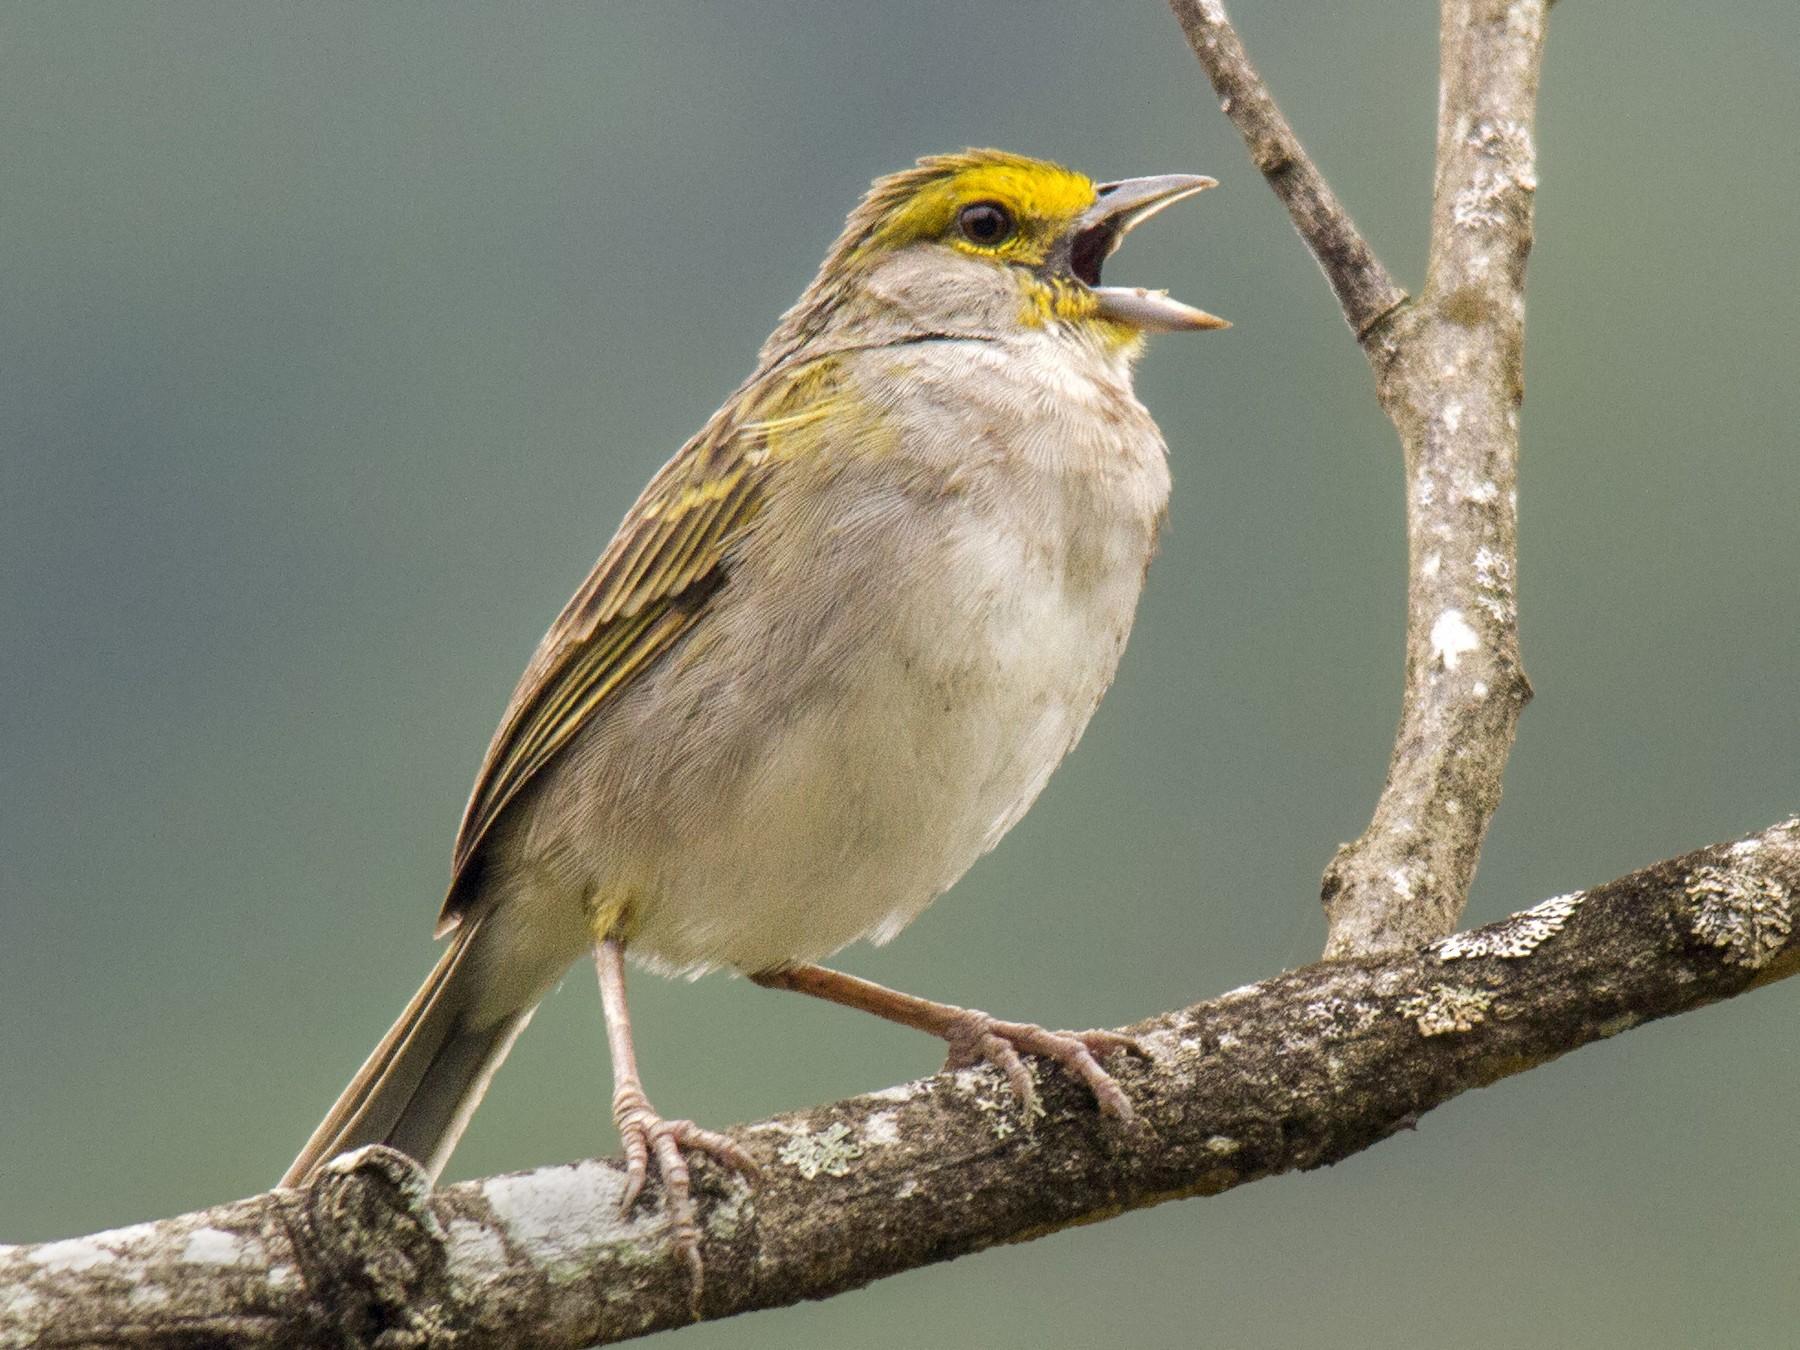 Yellow-browed Sparrow - Andres Vasquez